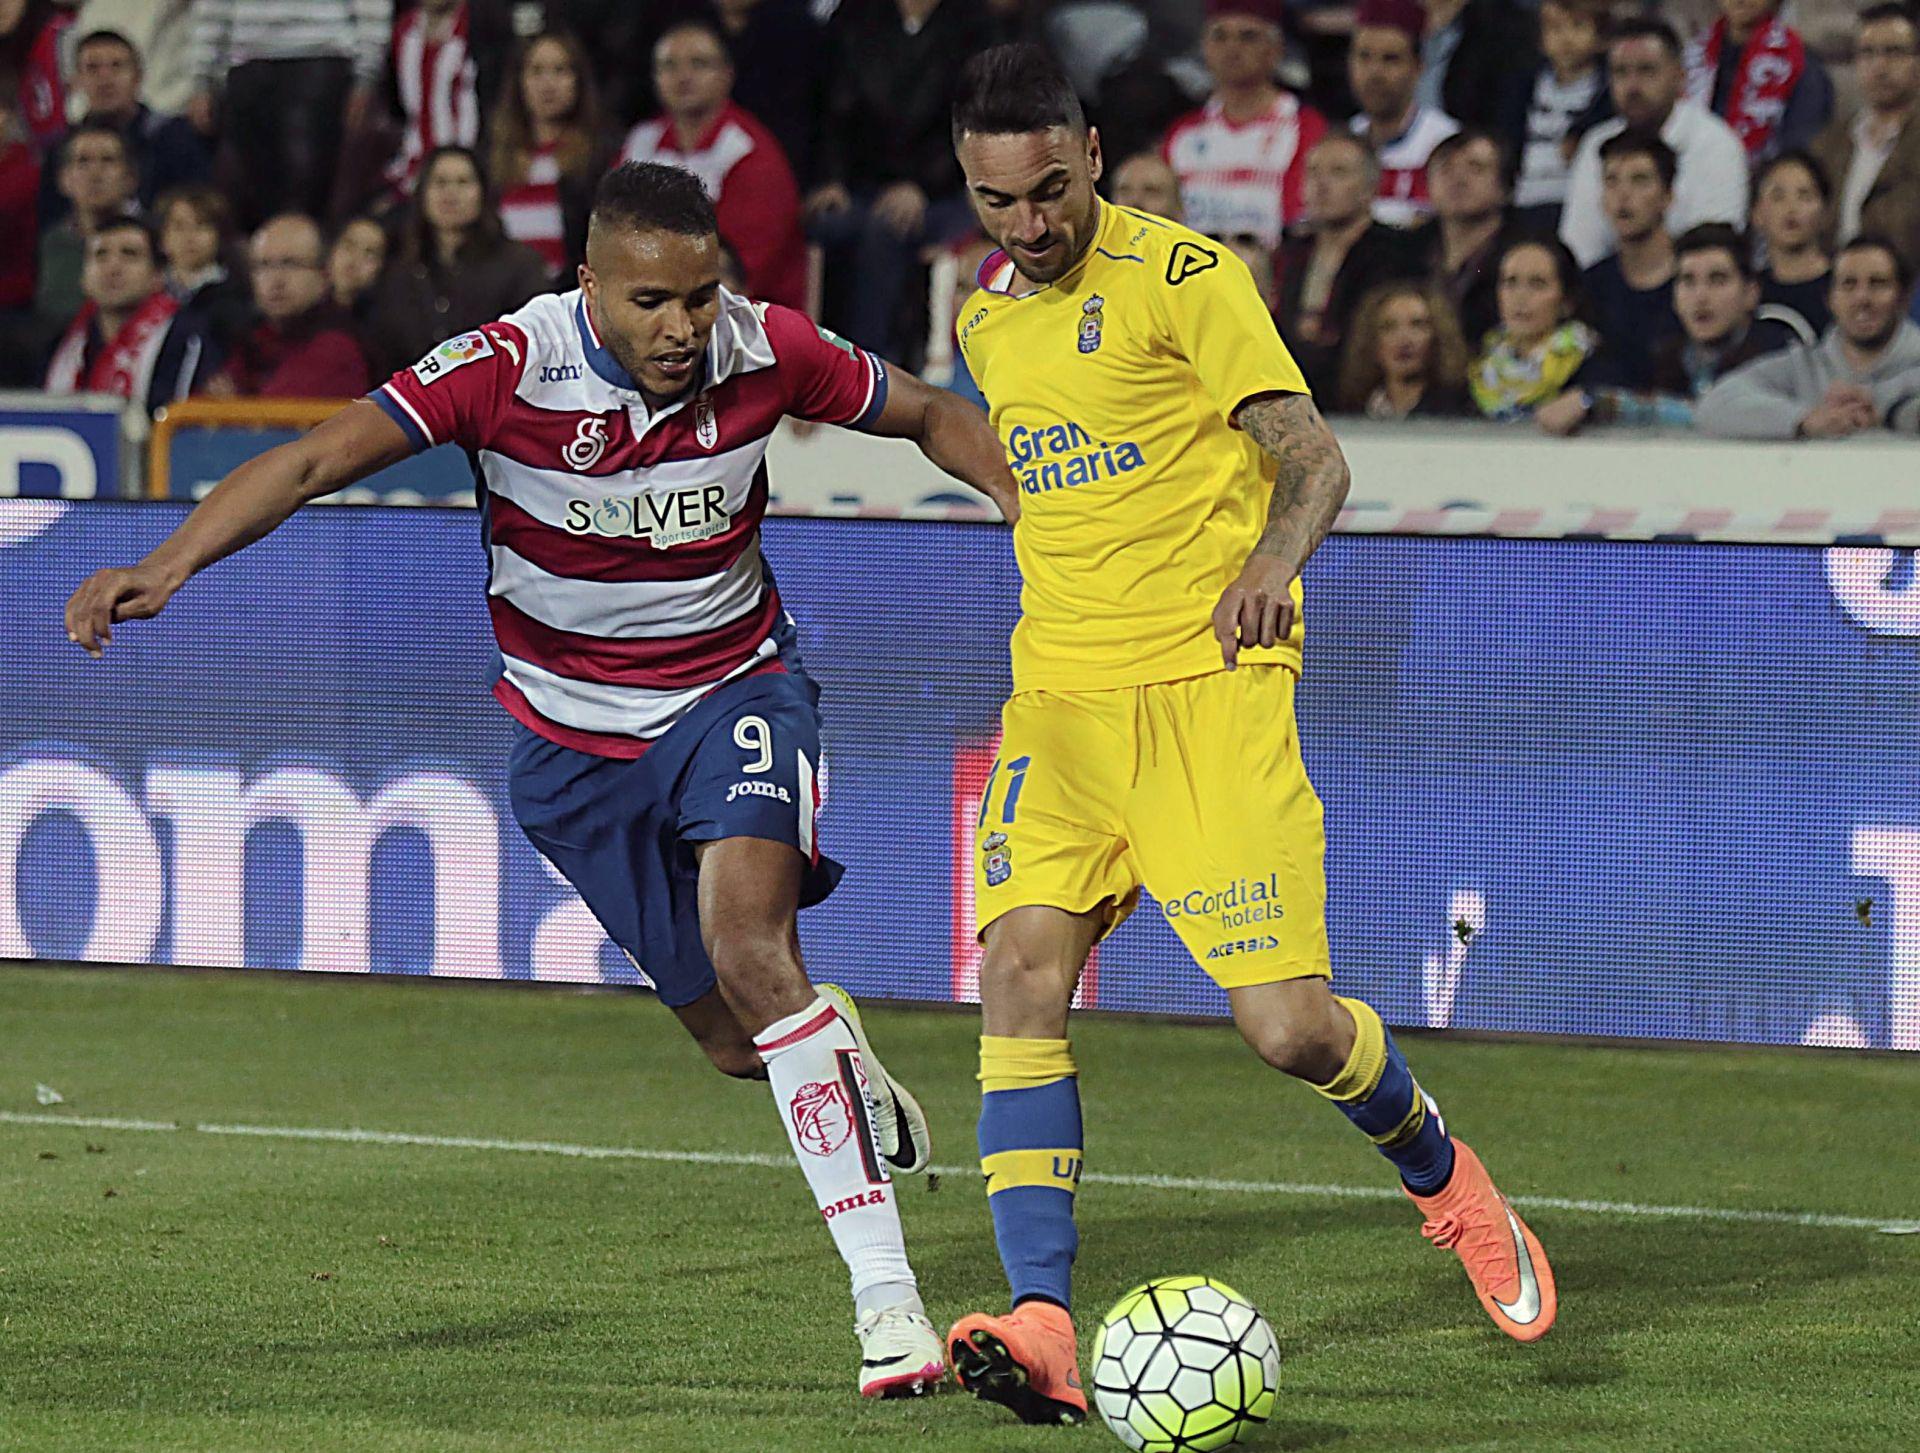 Granada – Las Palmas 3-2